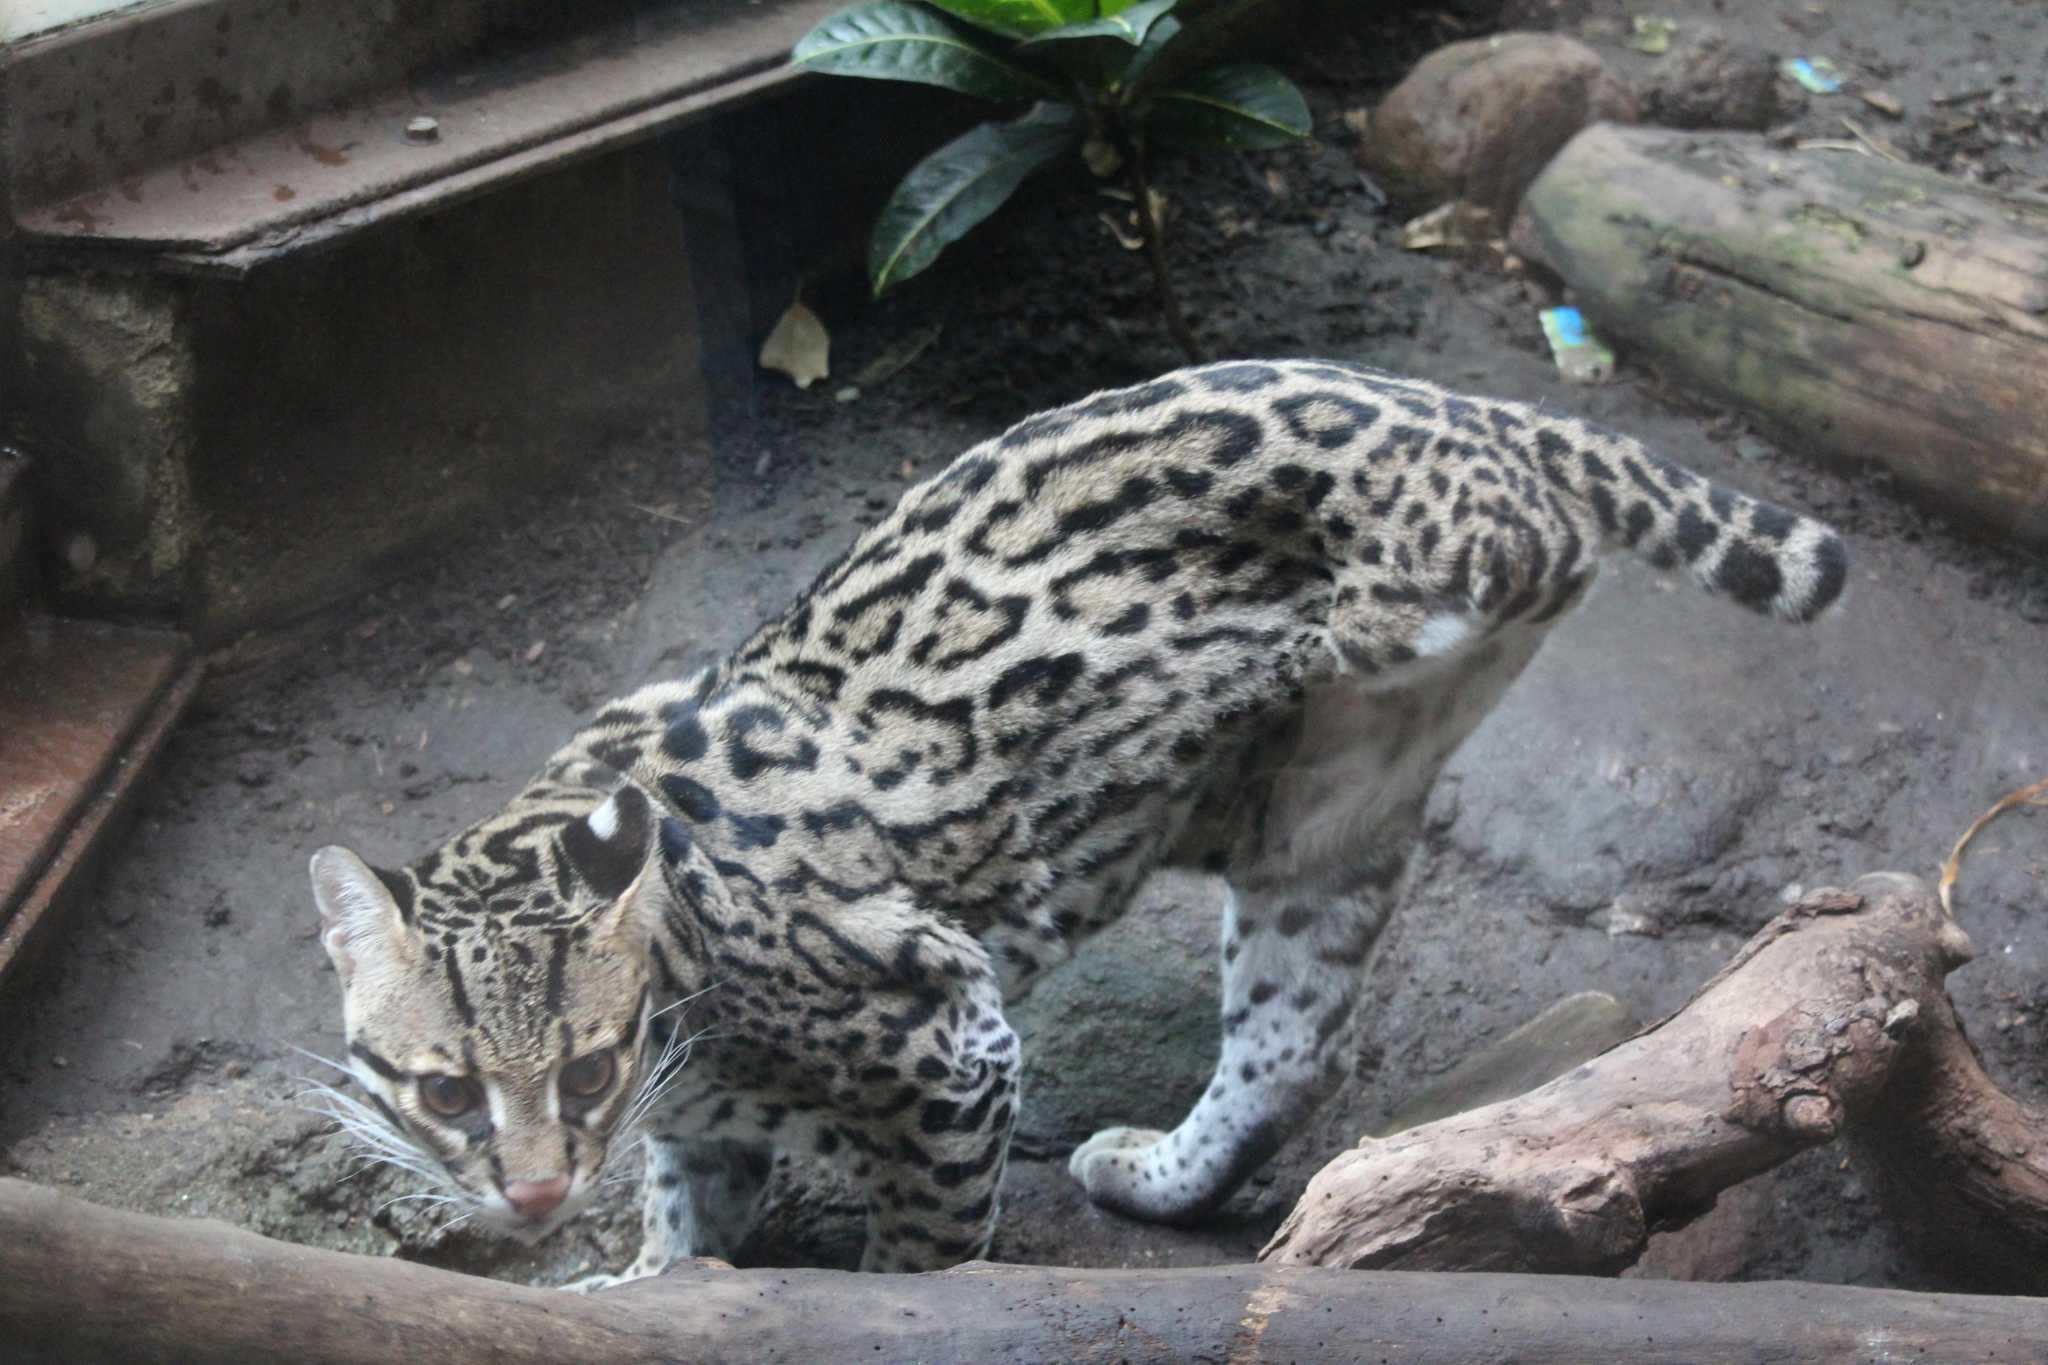 Beardsley Zoo's ocelot Kuma, has died